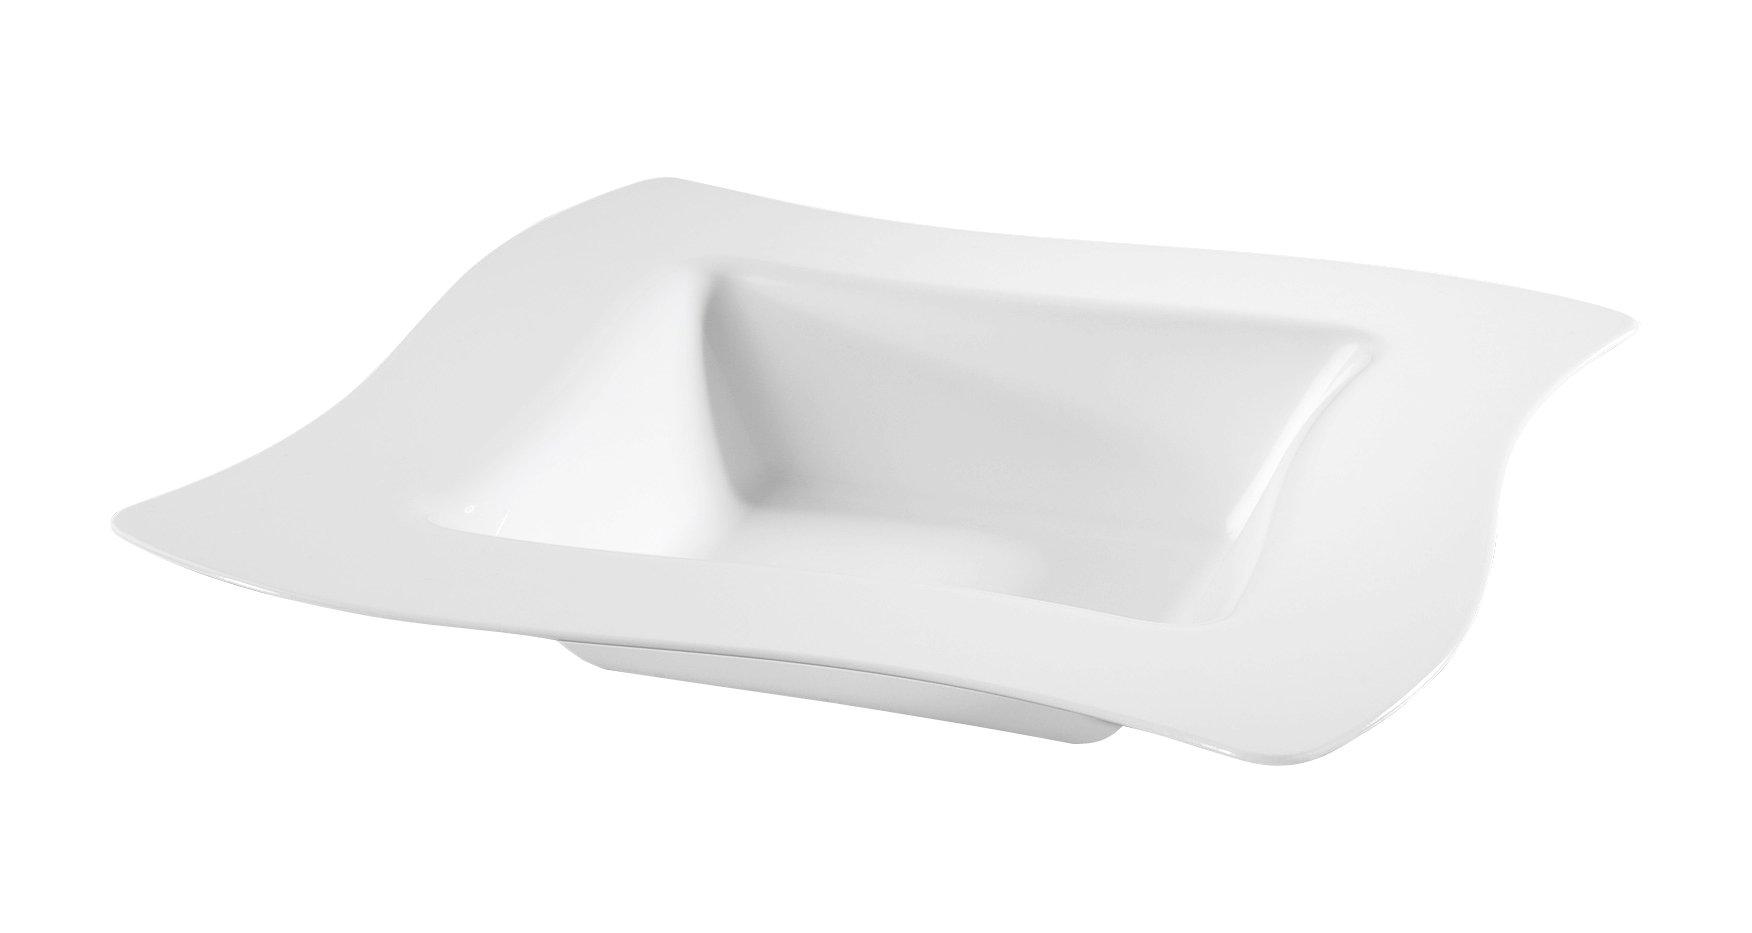 Fineline Wave trends 12 oz Bowl (Case of 120) (10 x 12), White